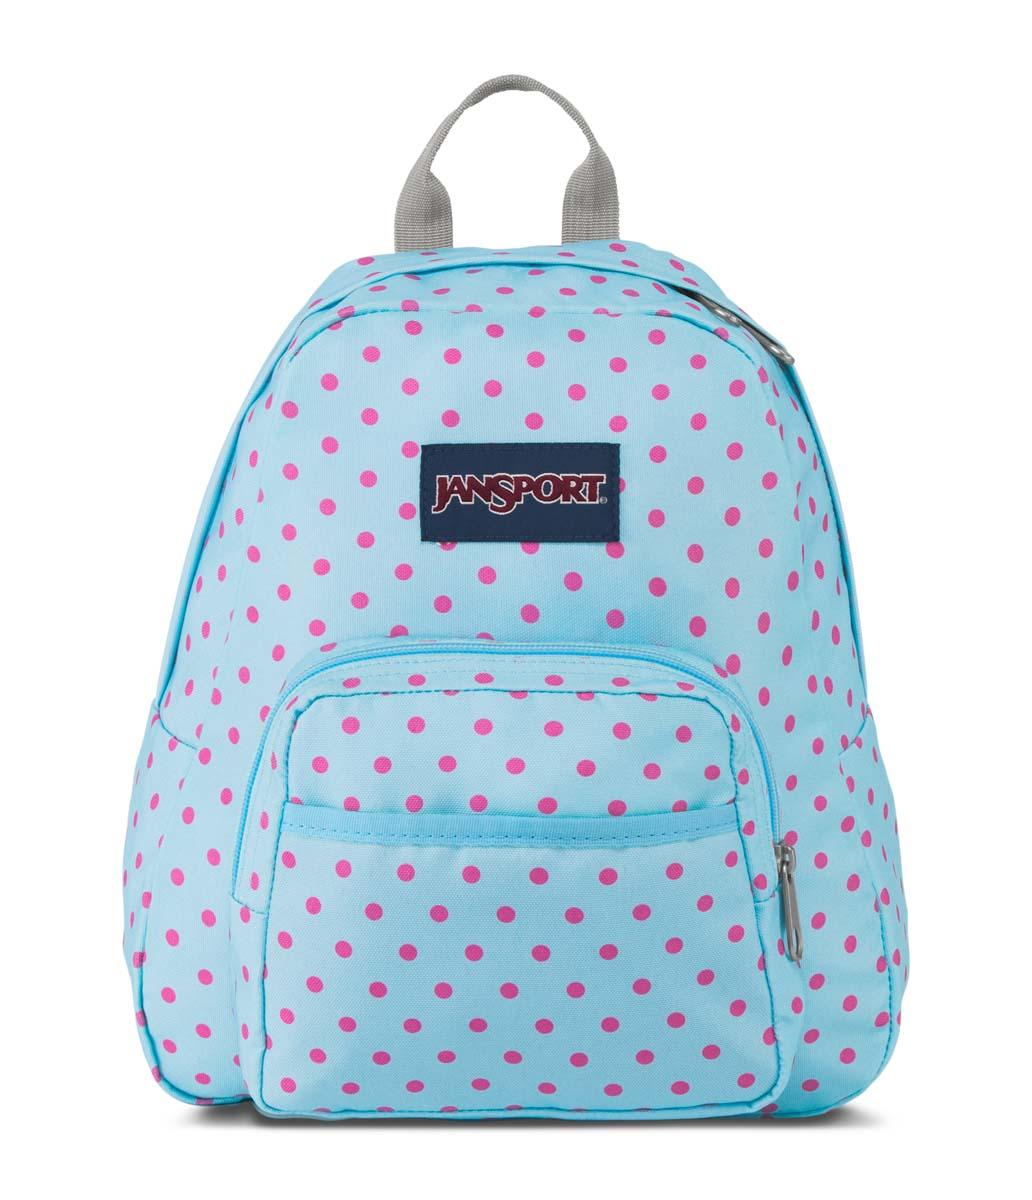 JanSport กระเป๋าเป้ รุ่น Half Pint - Blue Topaz/Lipstick Kiss Dot-O-Rama